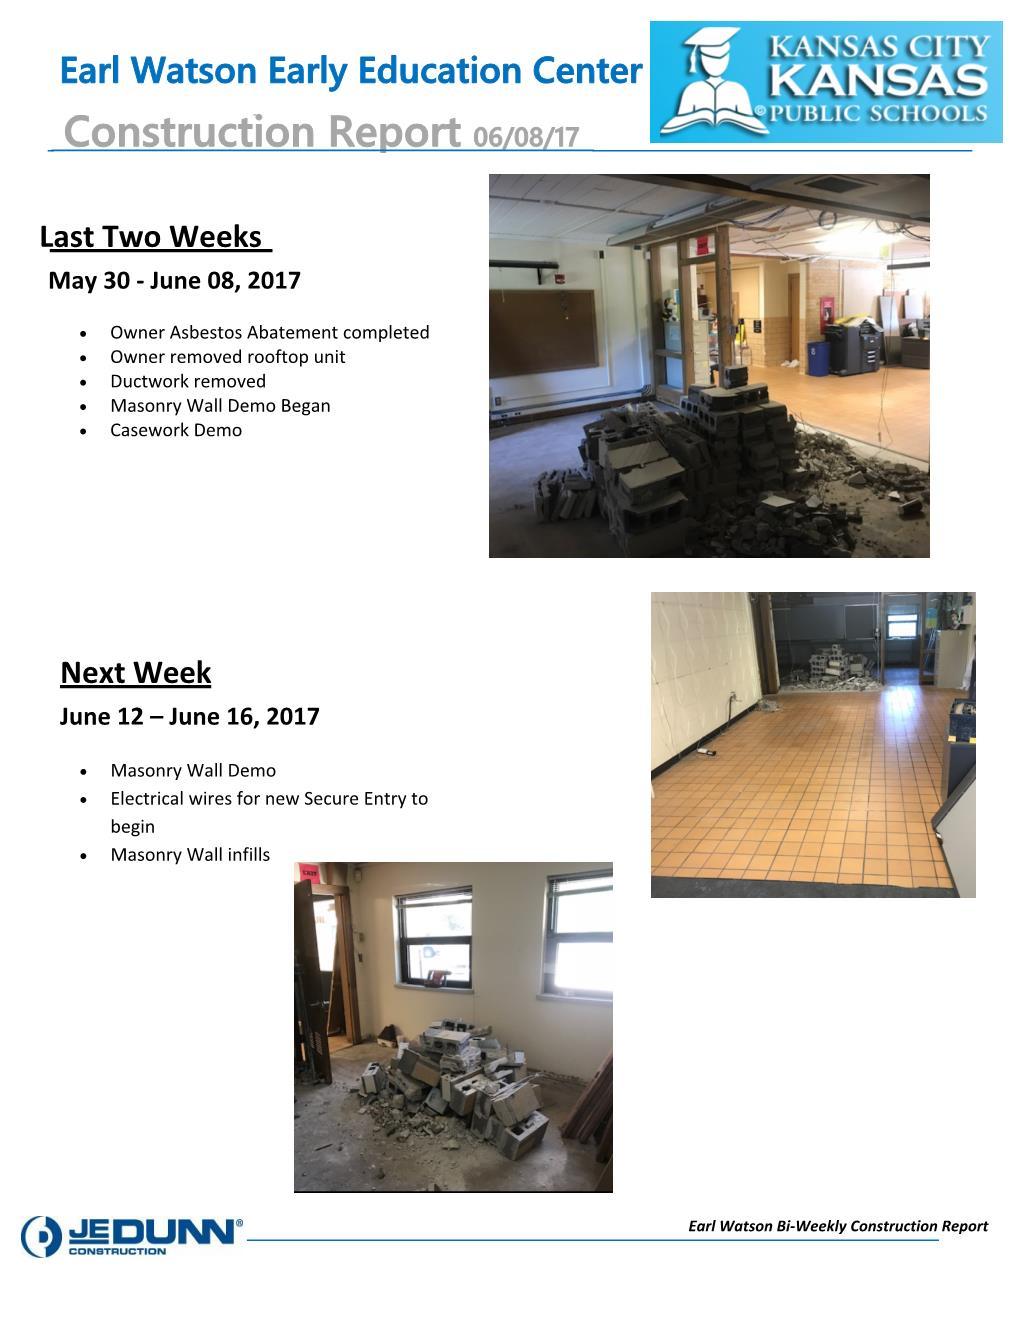 Earl Watson Construction Report 06.08.17.jpg